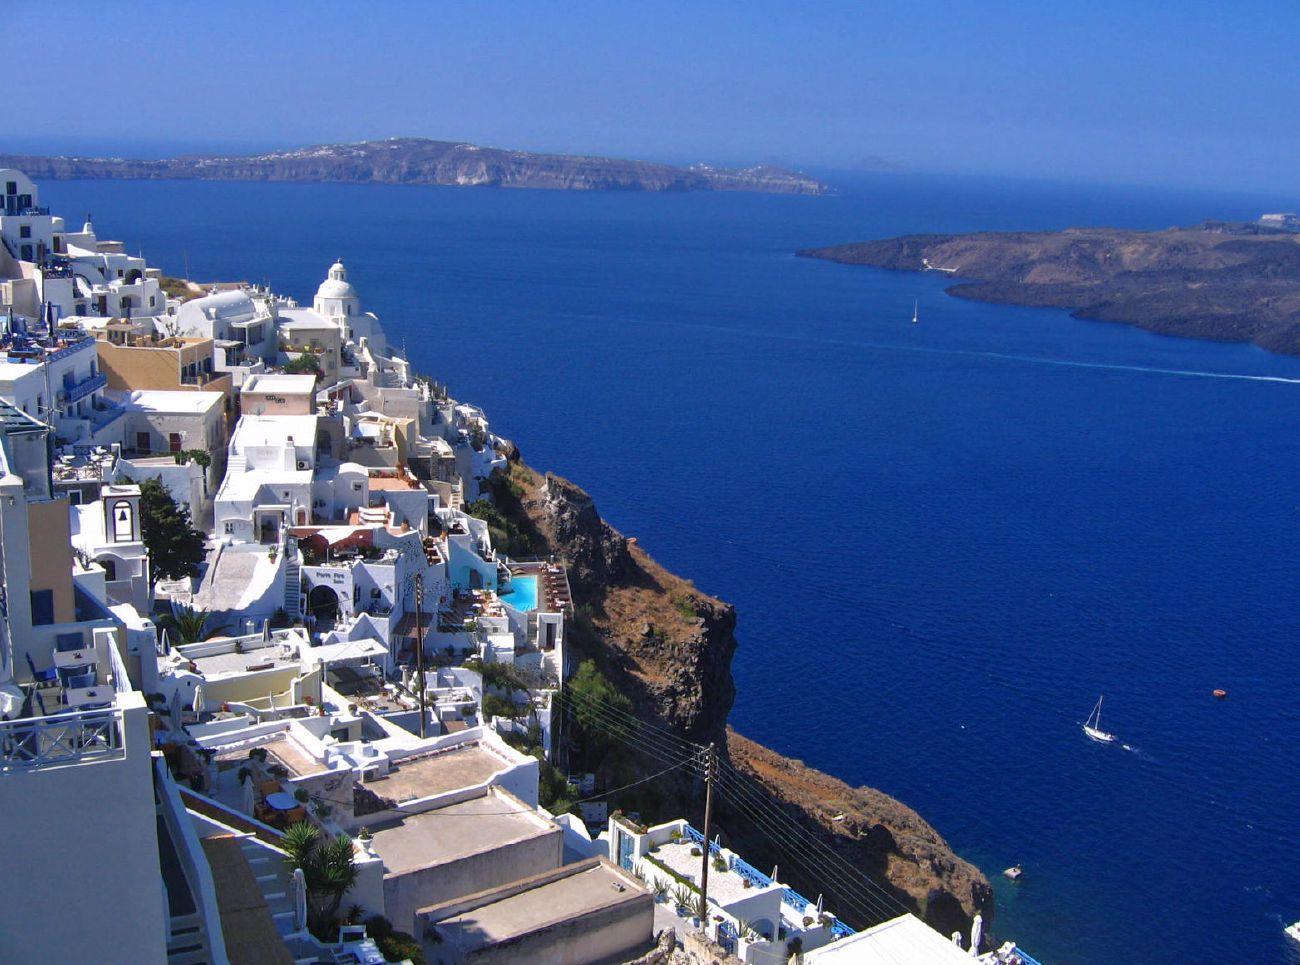 Un vulcan din Santorini ar putea erupe in viitorul apropiat. Ultima eruptie a ingropat insula